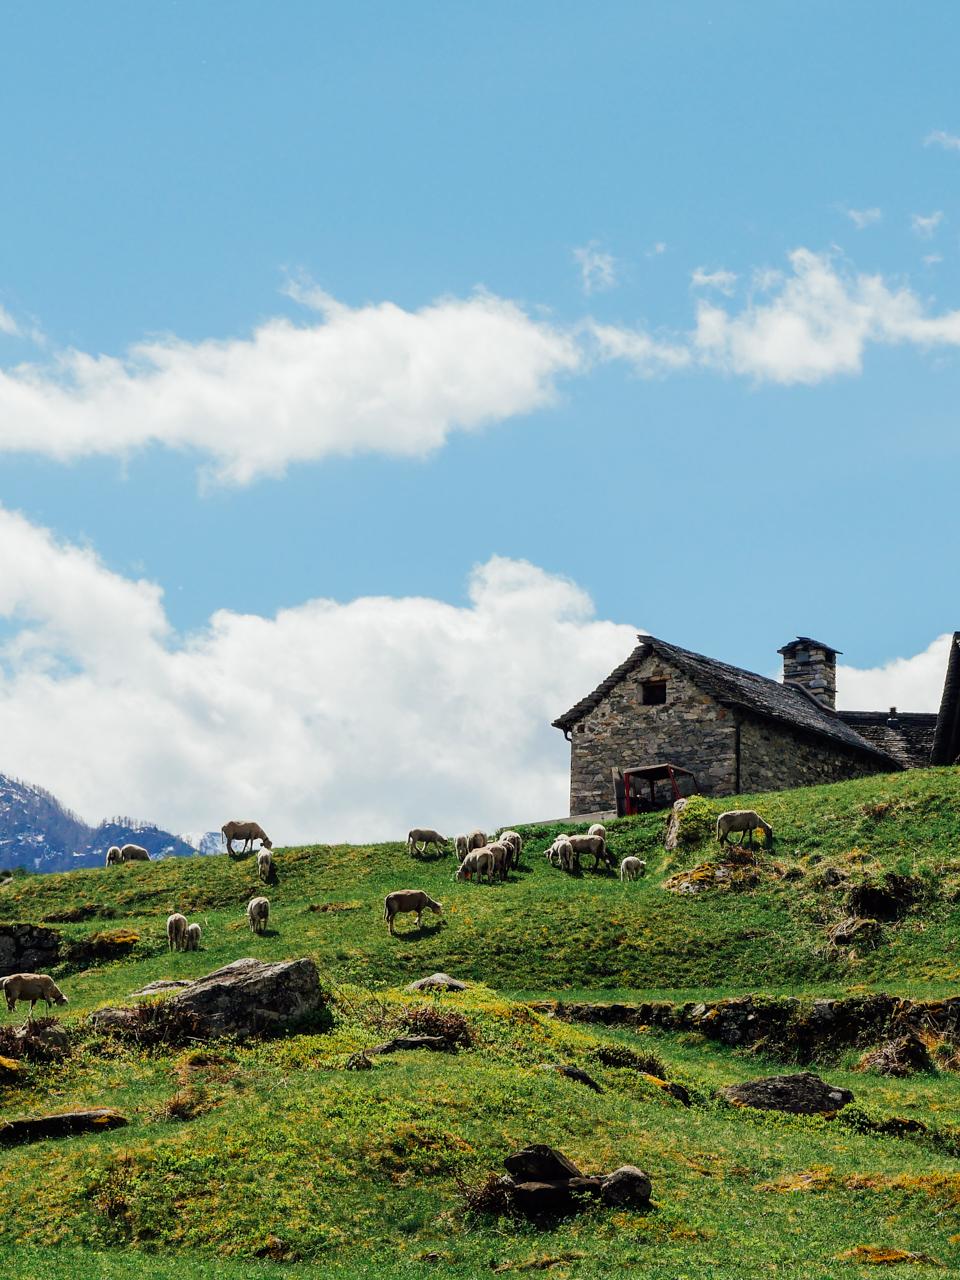 Typical Swiss landscape!